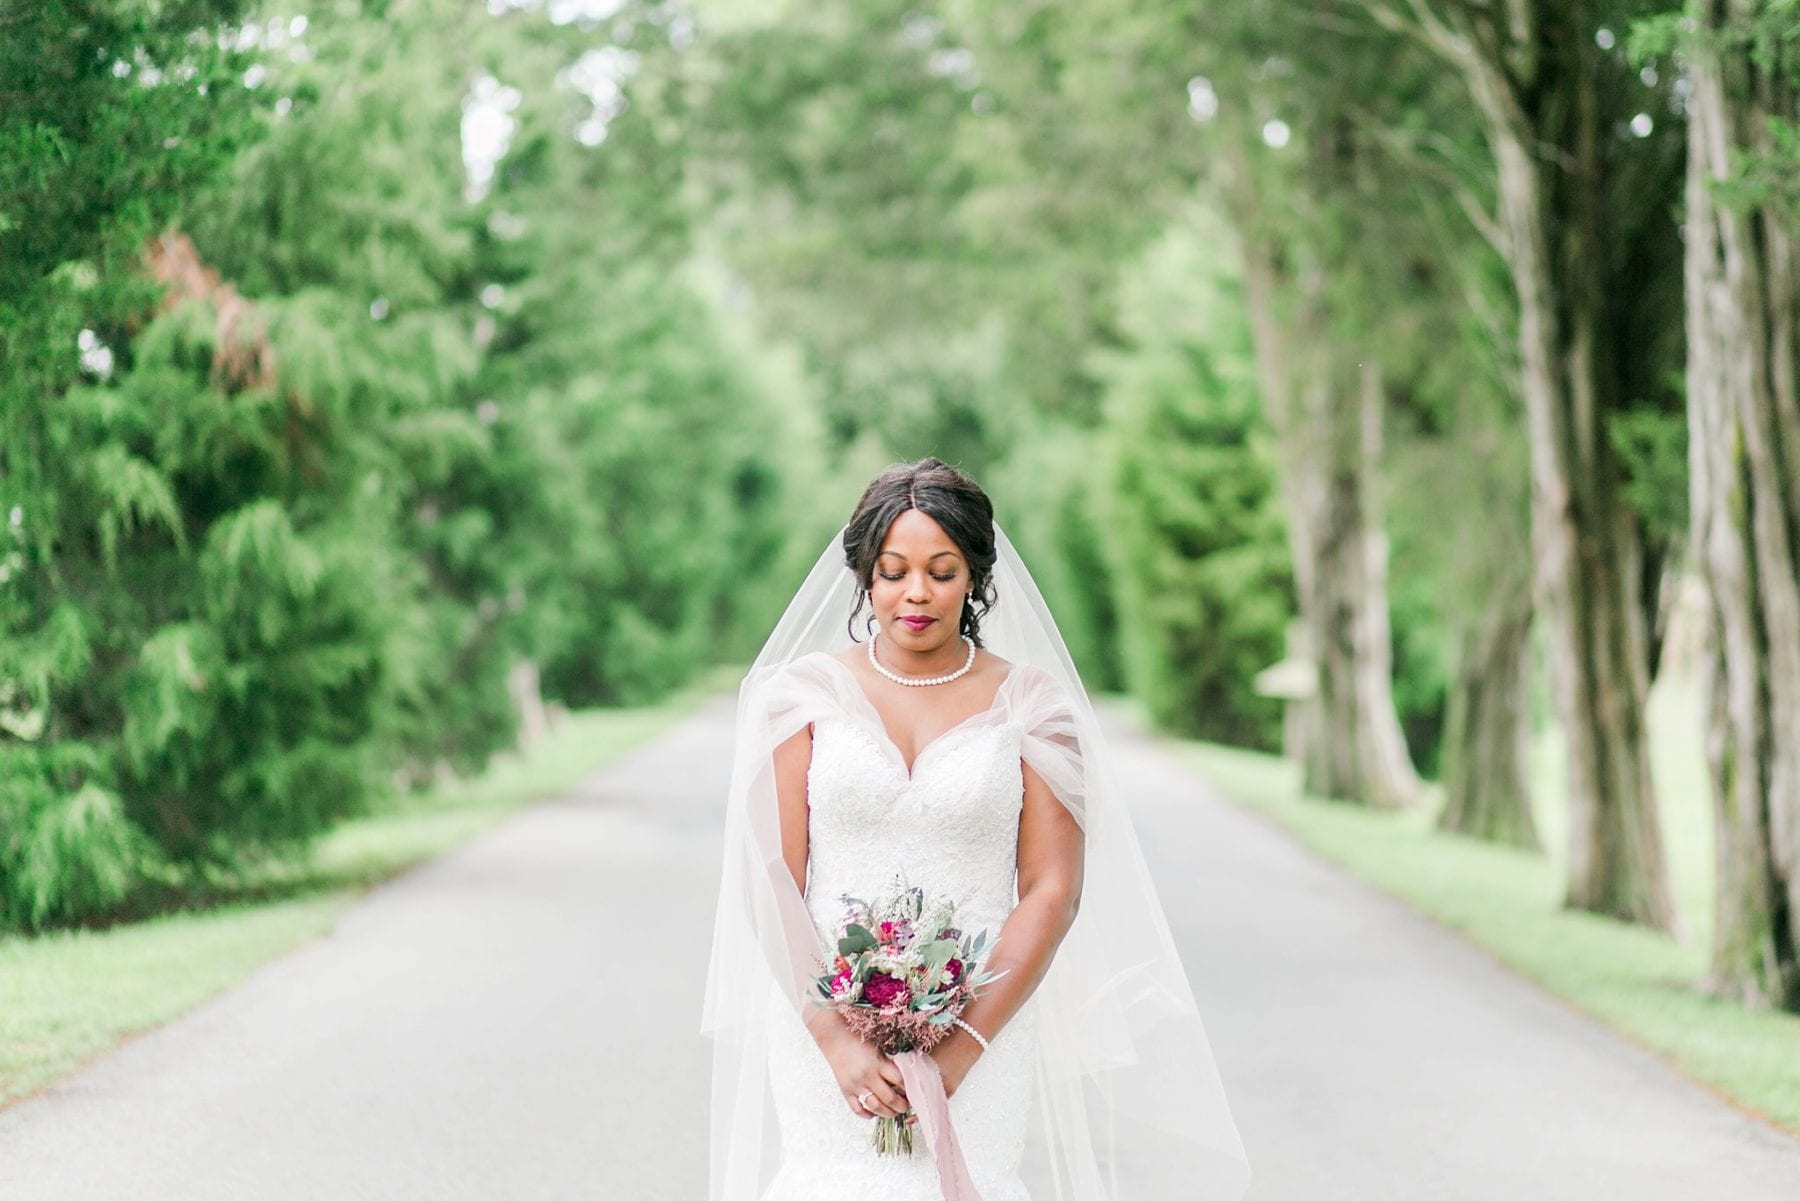 Jefferson Patterson Park Wedding Maryland Wedding Photographer Megan Kelsey Photography Jasmine & Seyi-68.jpg